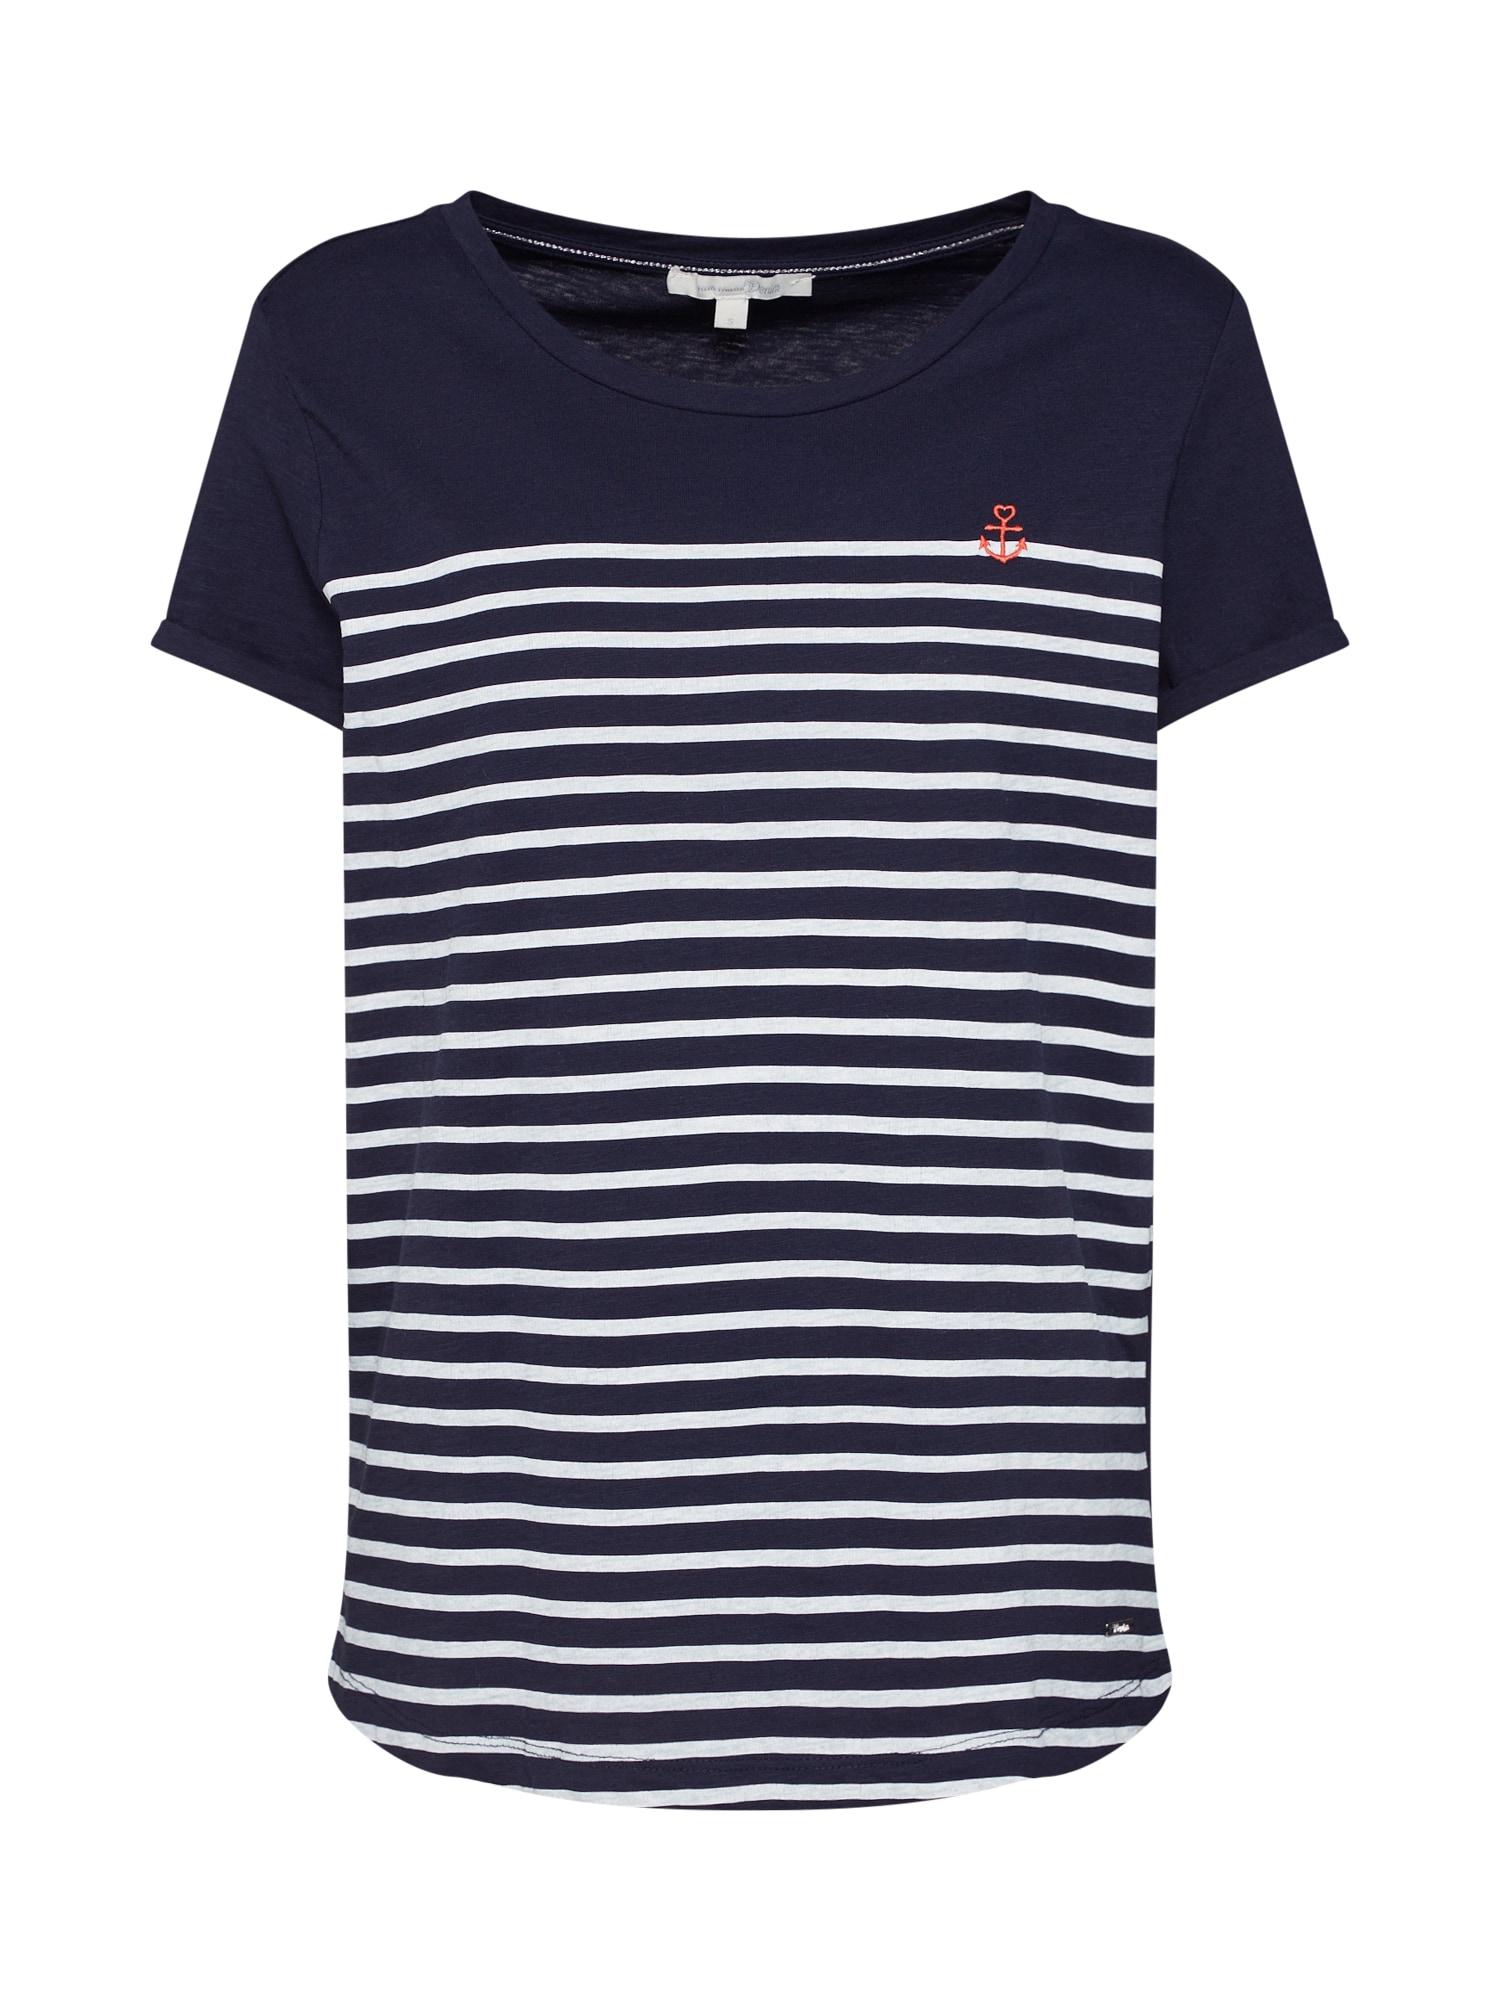 Tričko tmavě modrá červená bílá TOM TAILOR DENIM